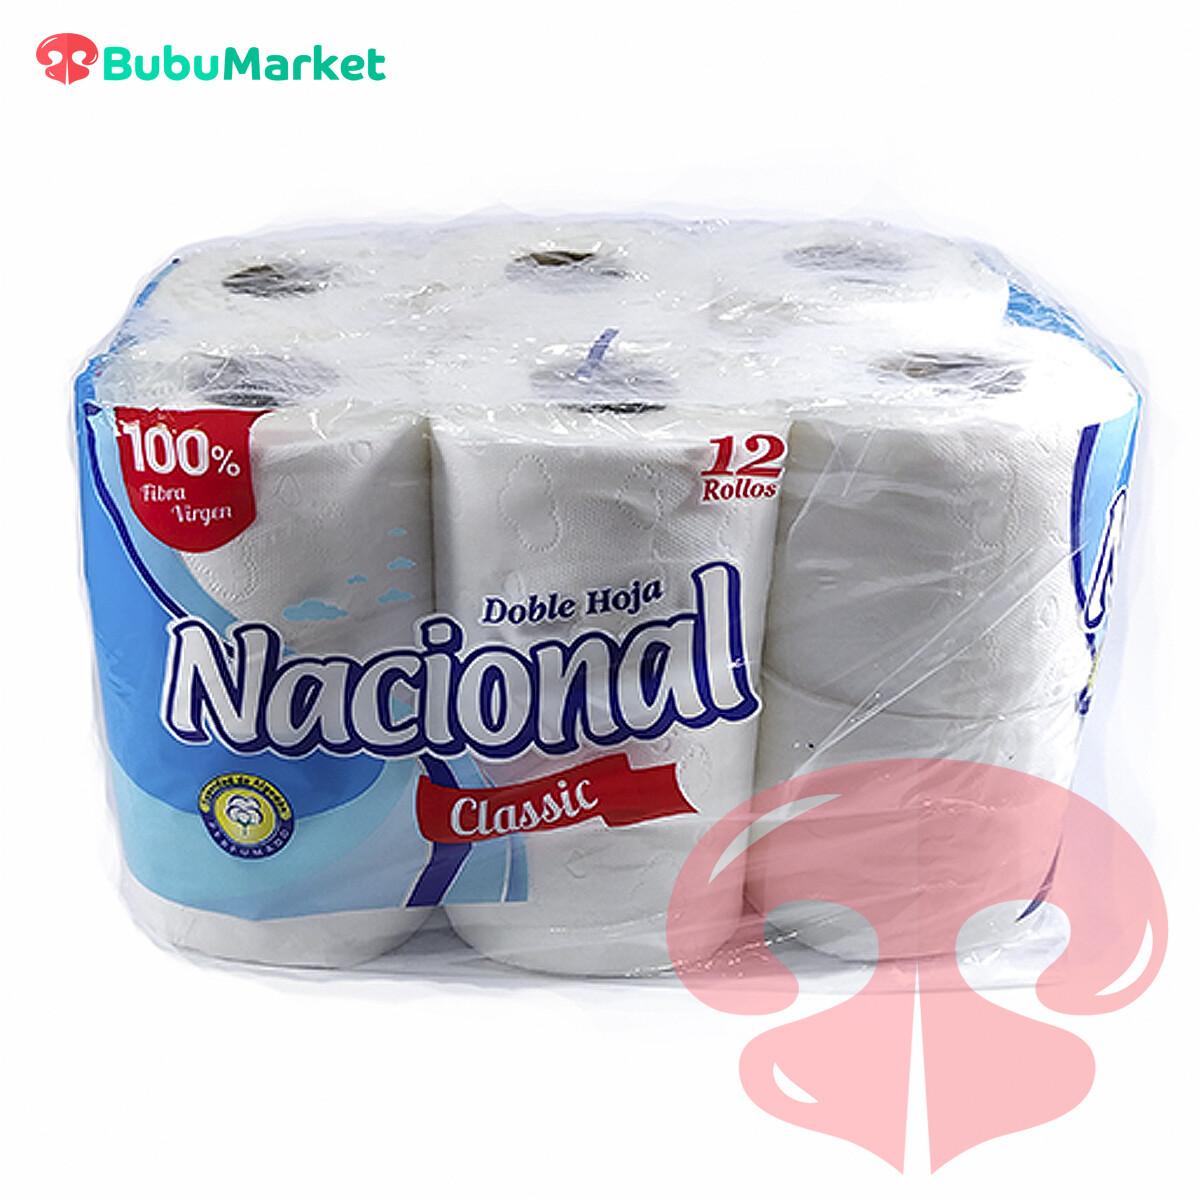 PAPEL HIGIENICO DOBLE HOJA NACIONAL CLASISIC 12 ROLLOS